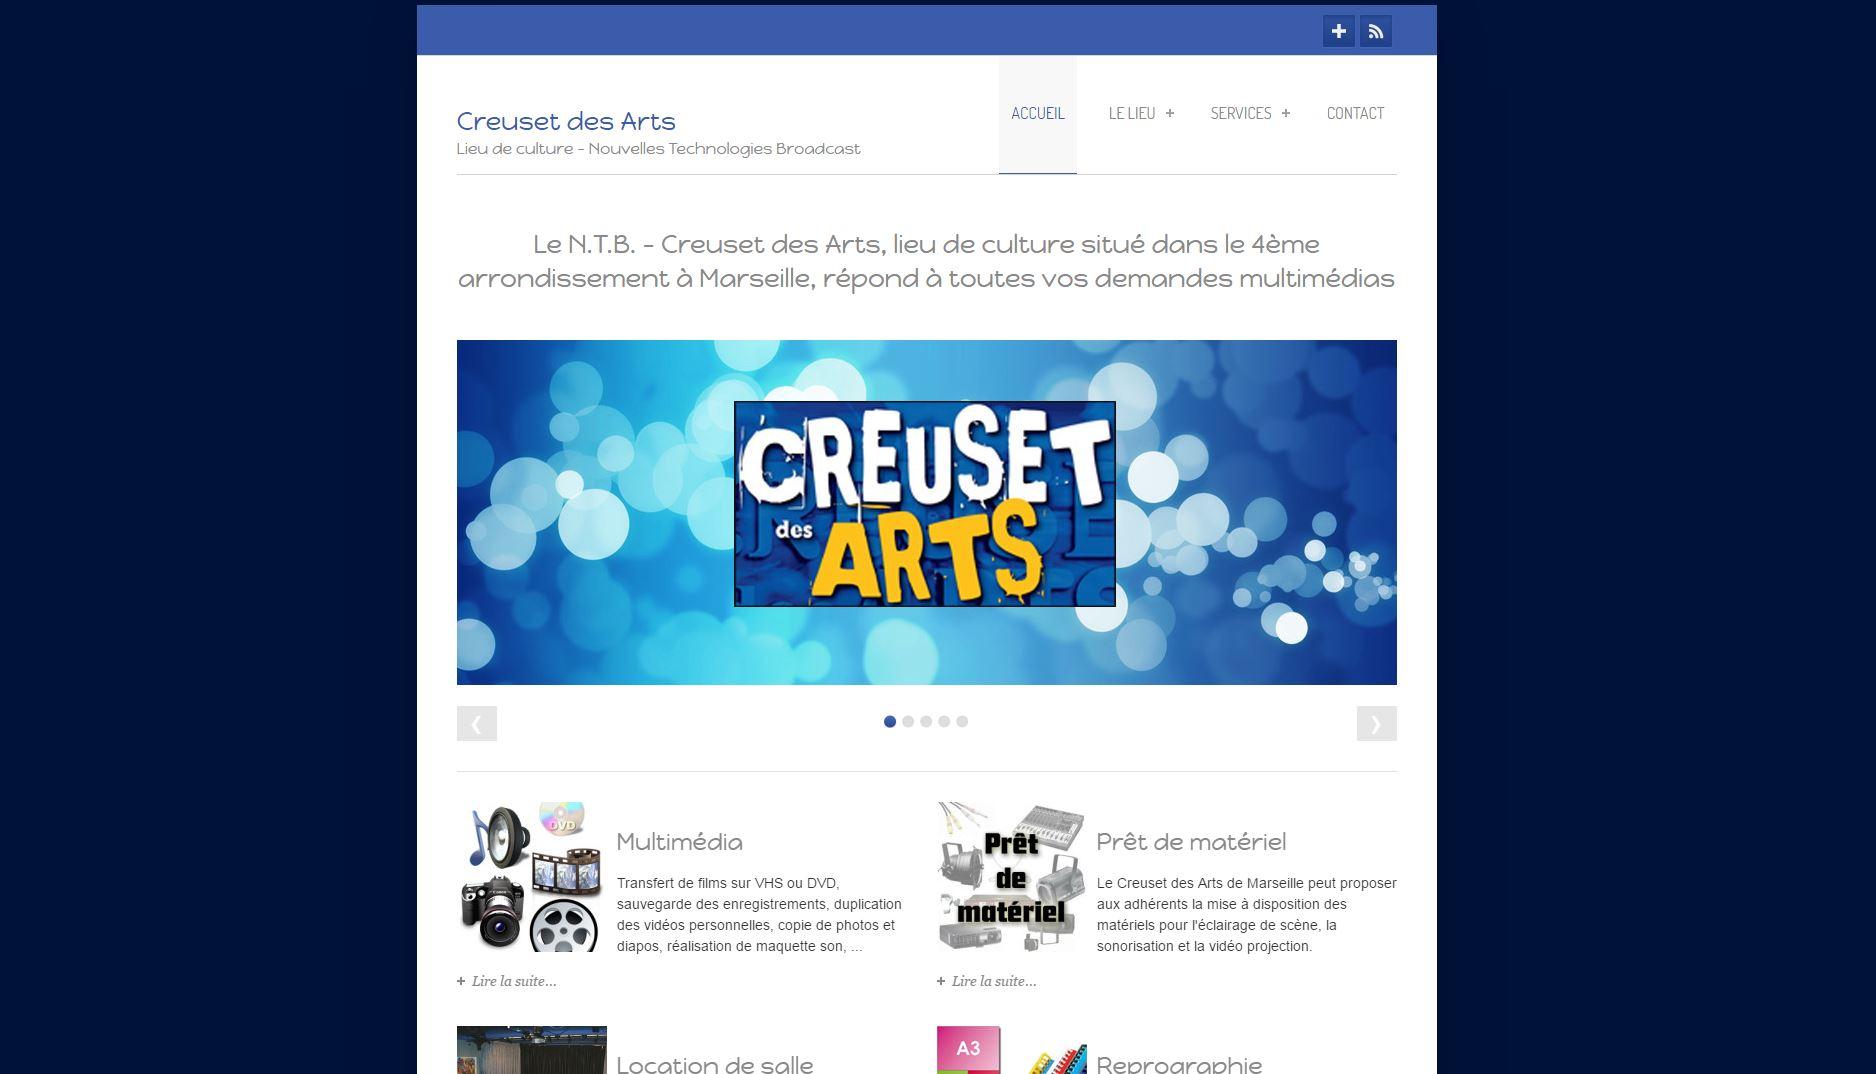 Capture-CreusetdesArts-2013